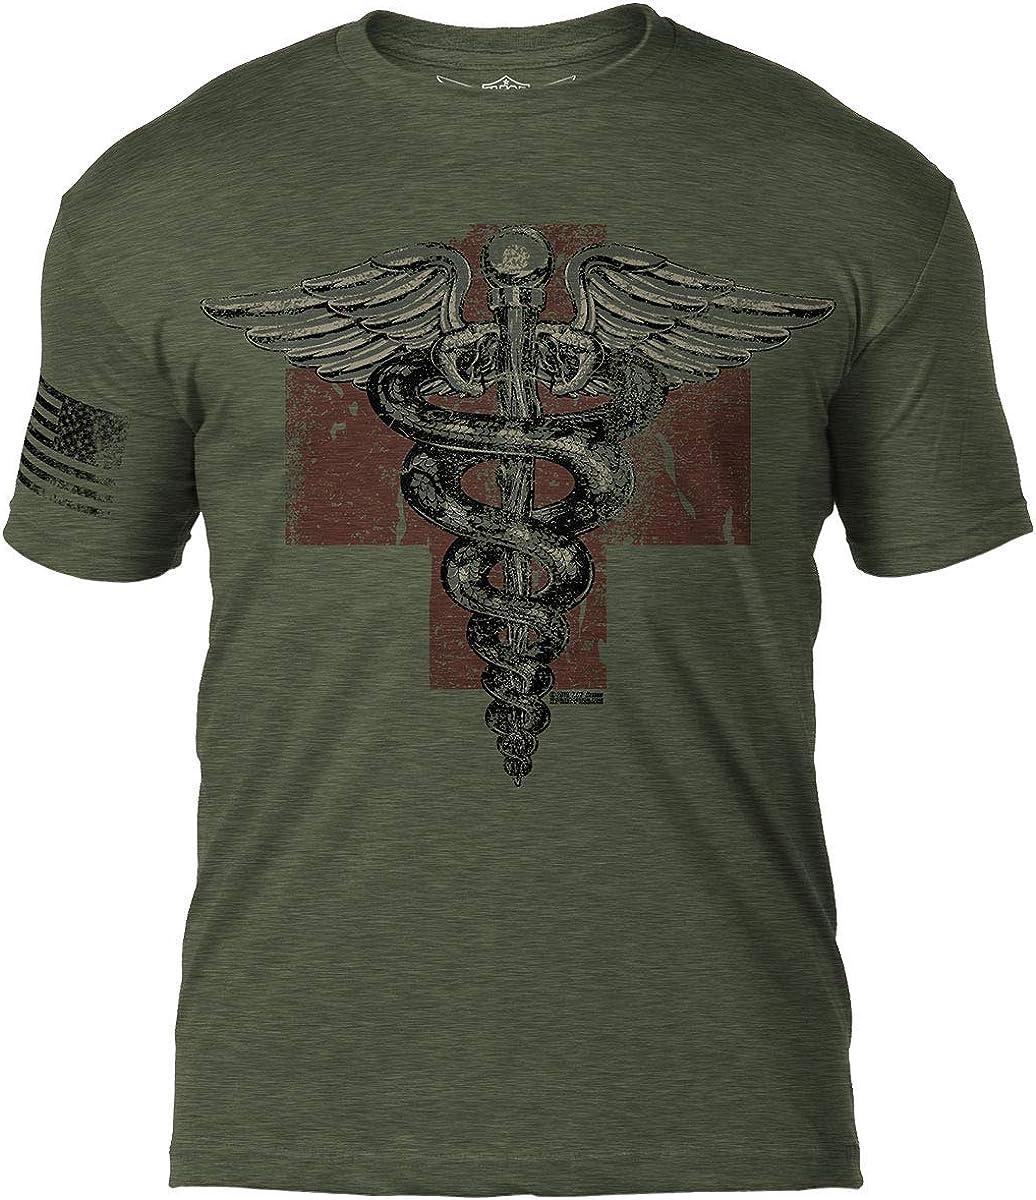 7.62 Design Medic Vintage Logo Heather Military Green